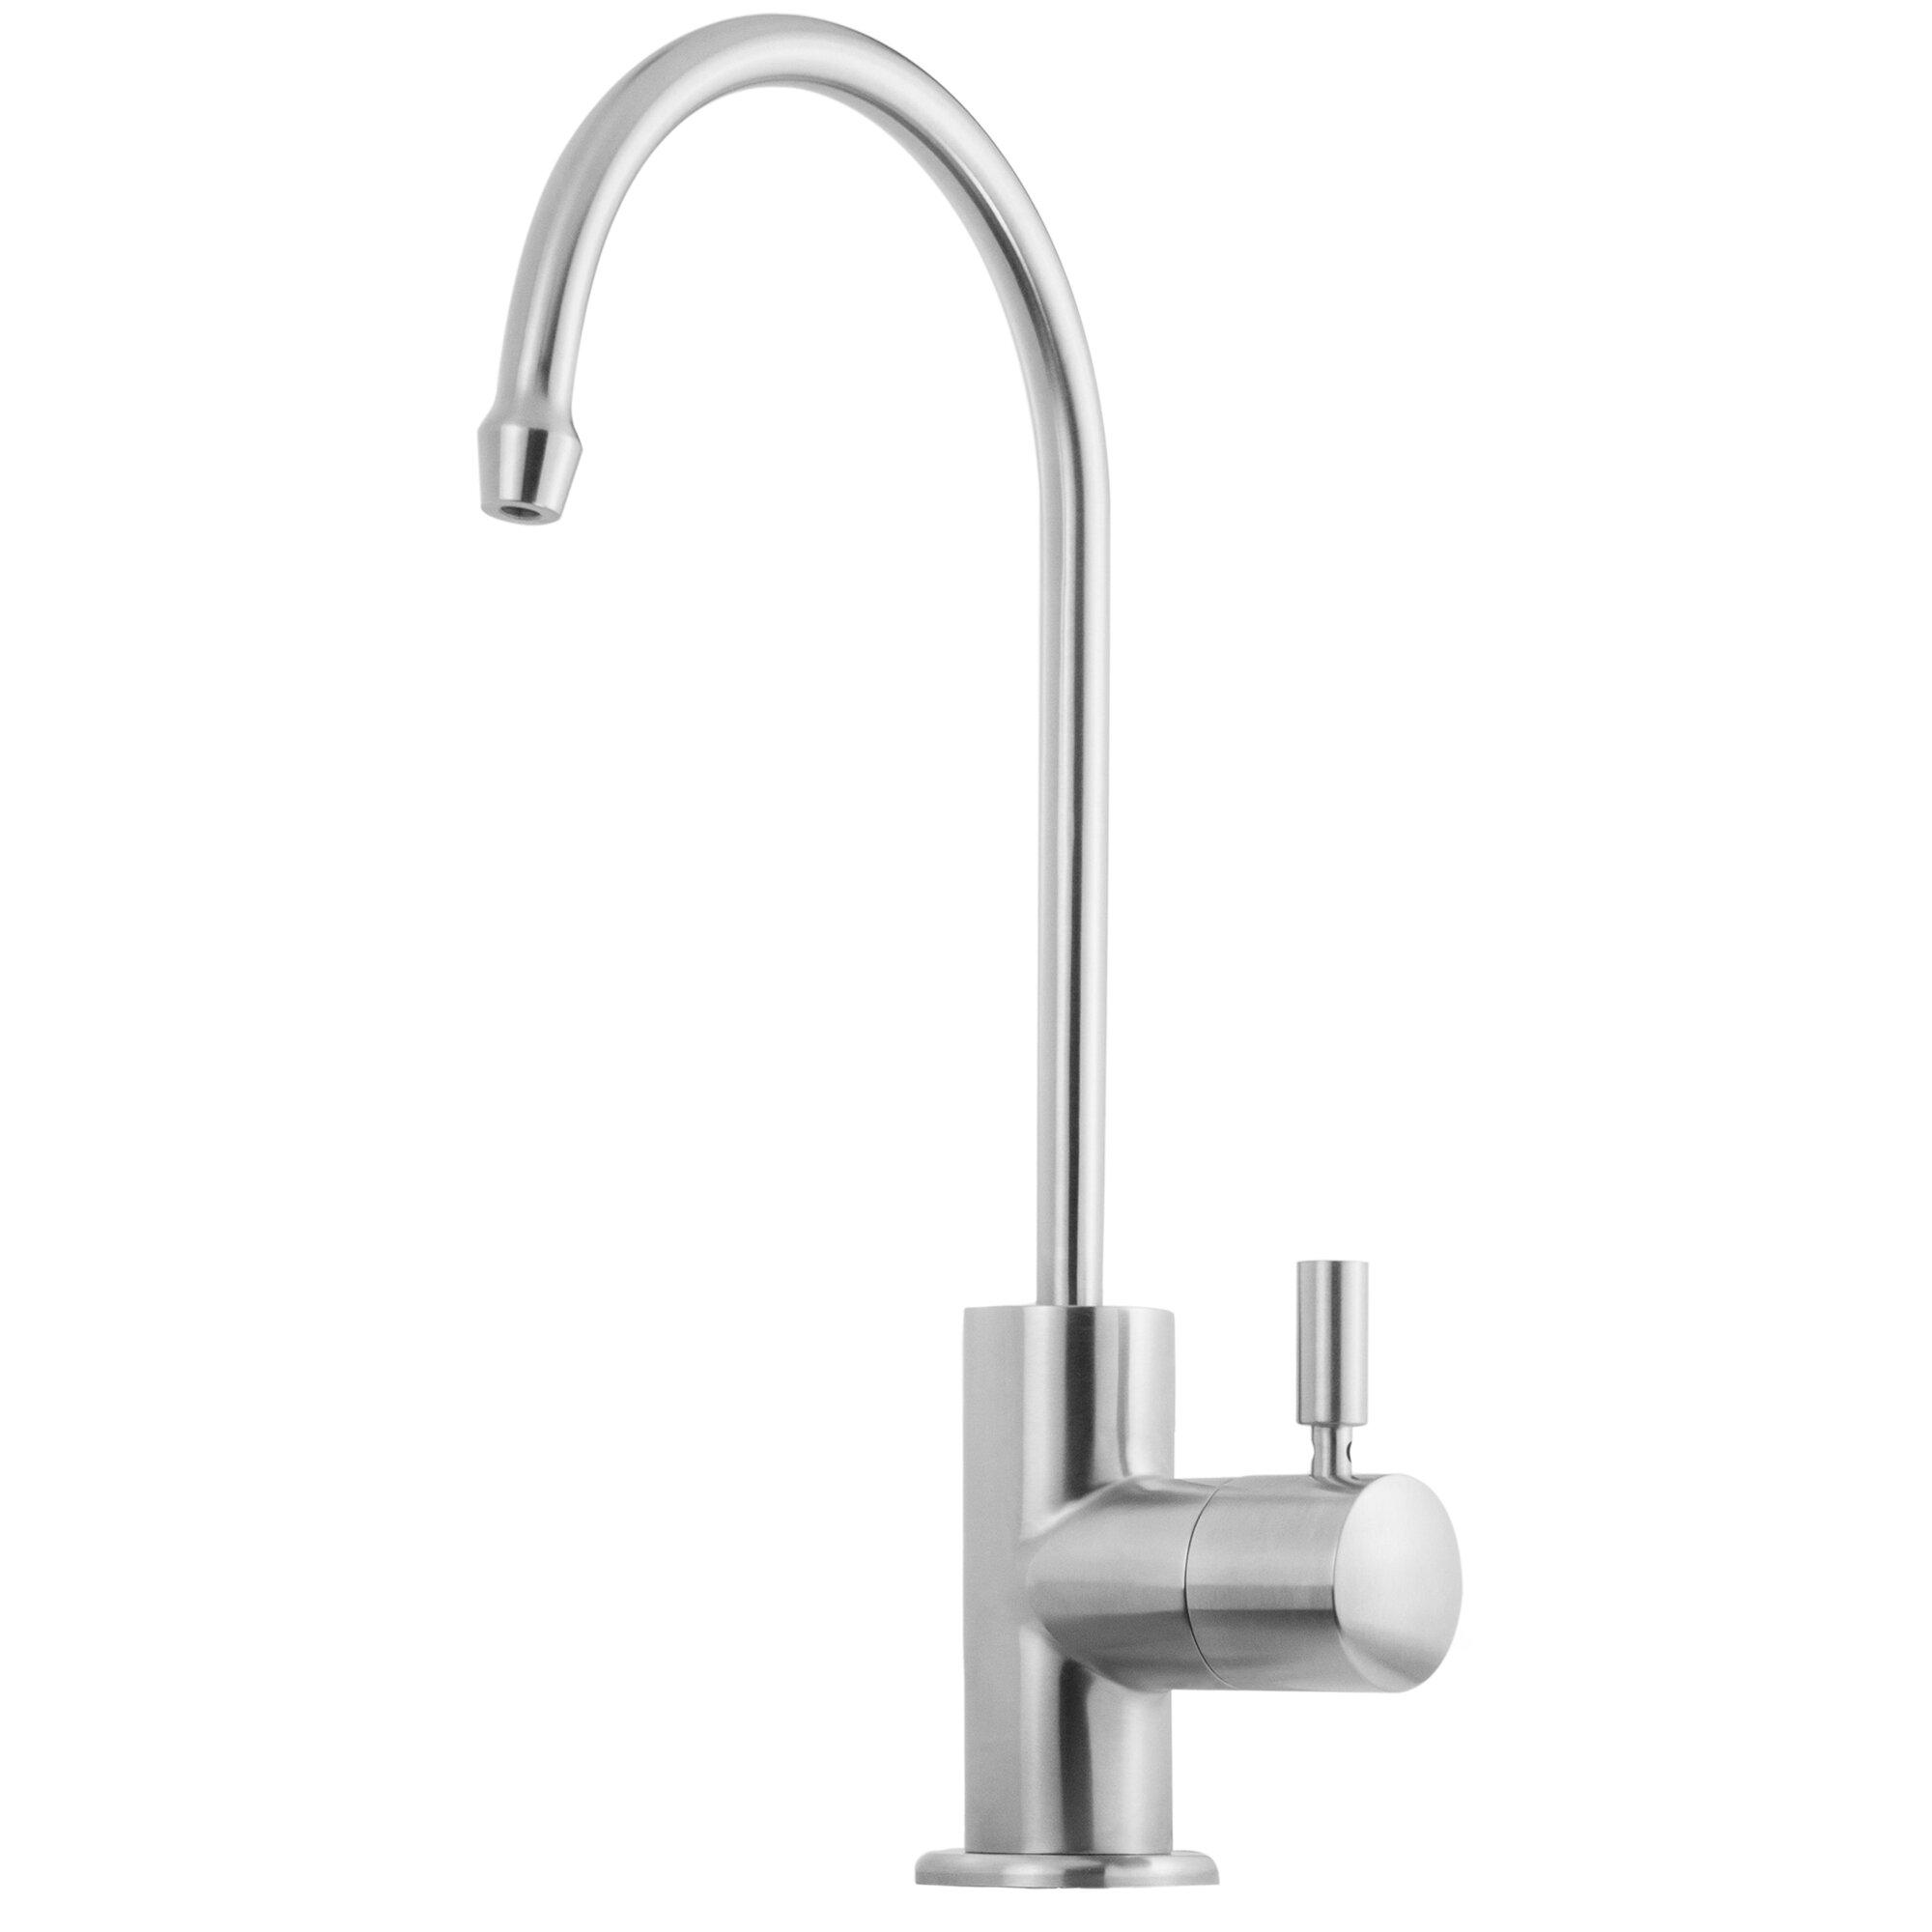 Andorra Reverse Osmosis Water Filter Kitchen Faucet